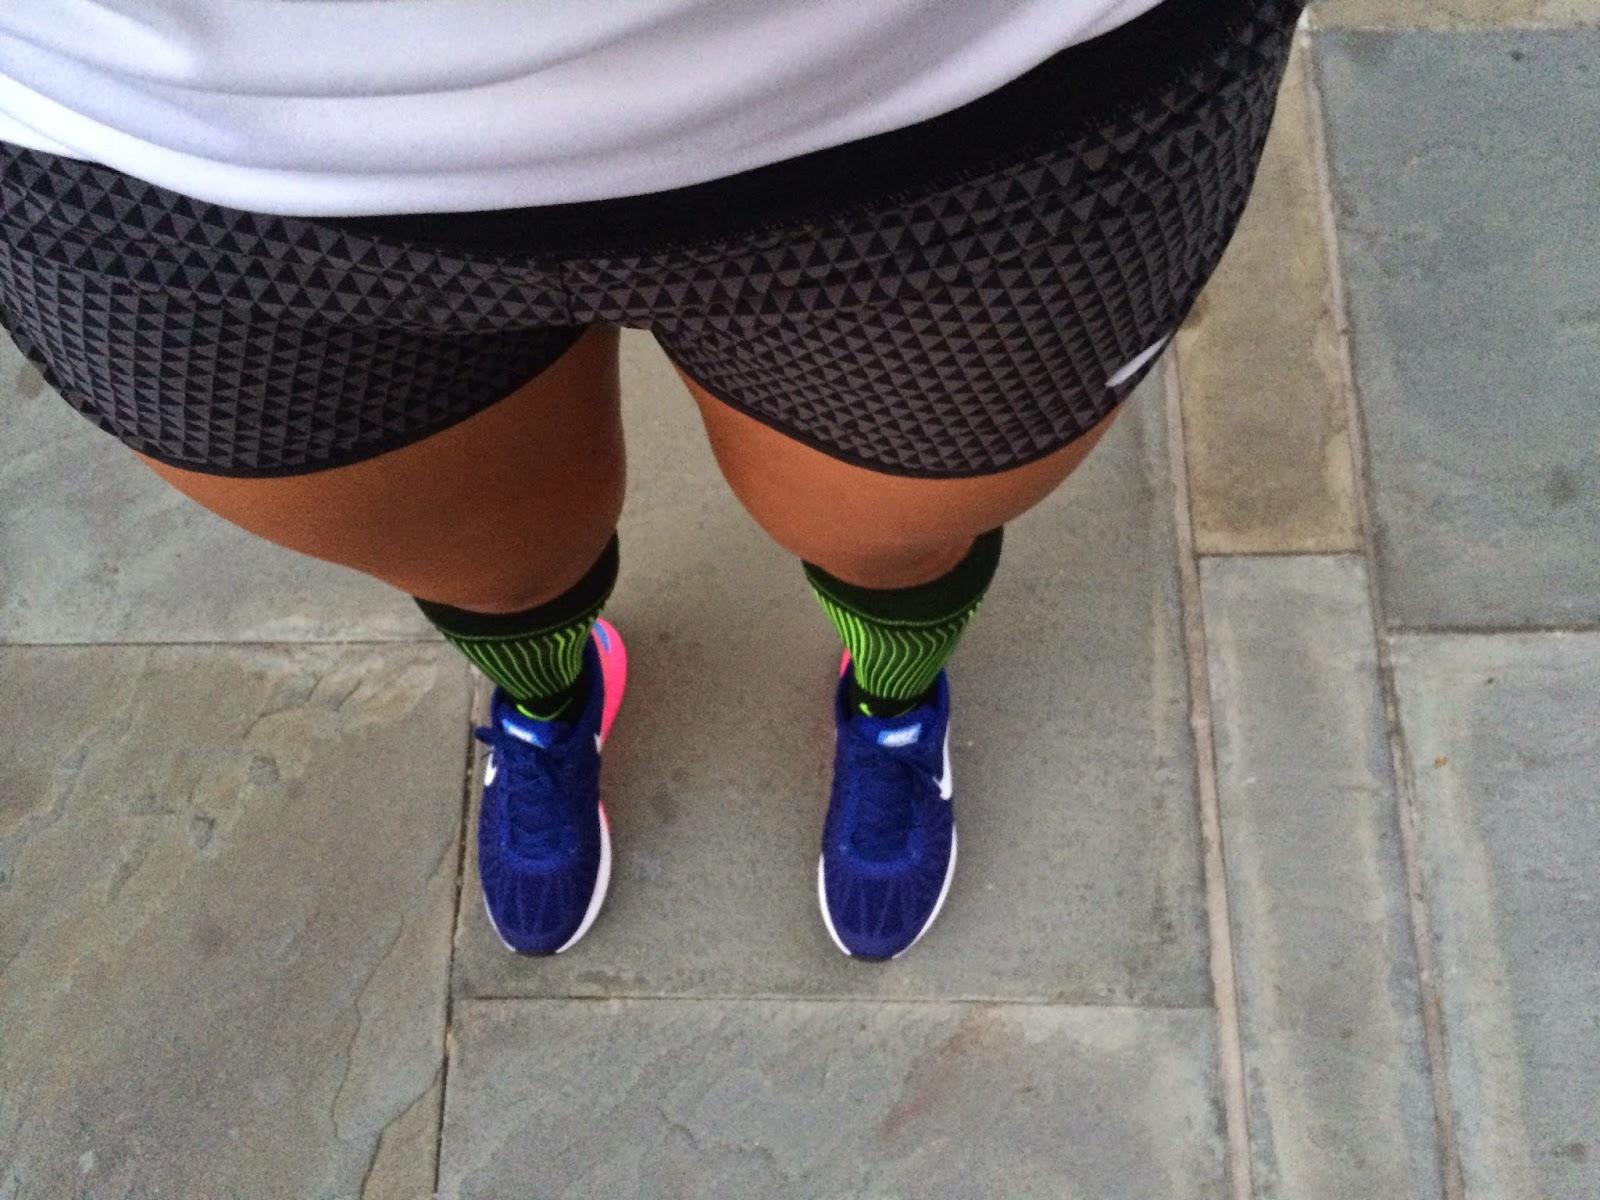 3df0ee5f3e First Impression: Nike Elite Graduated Compression. Monday, September 15,  2014